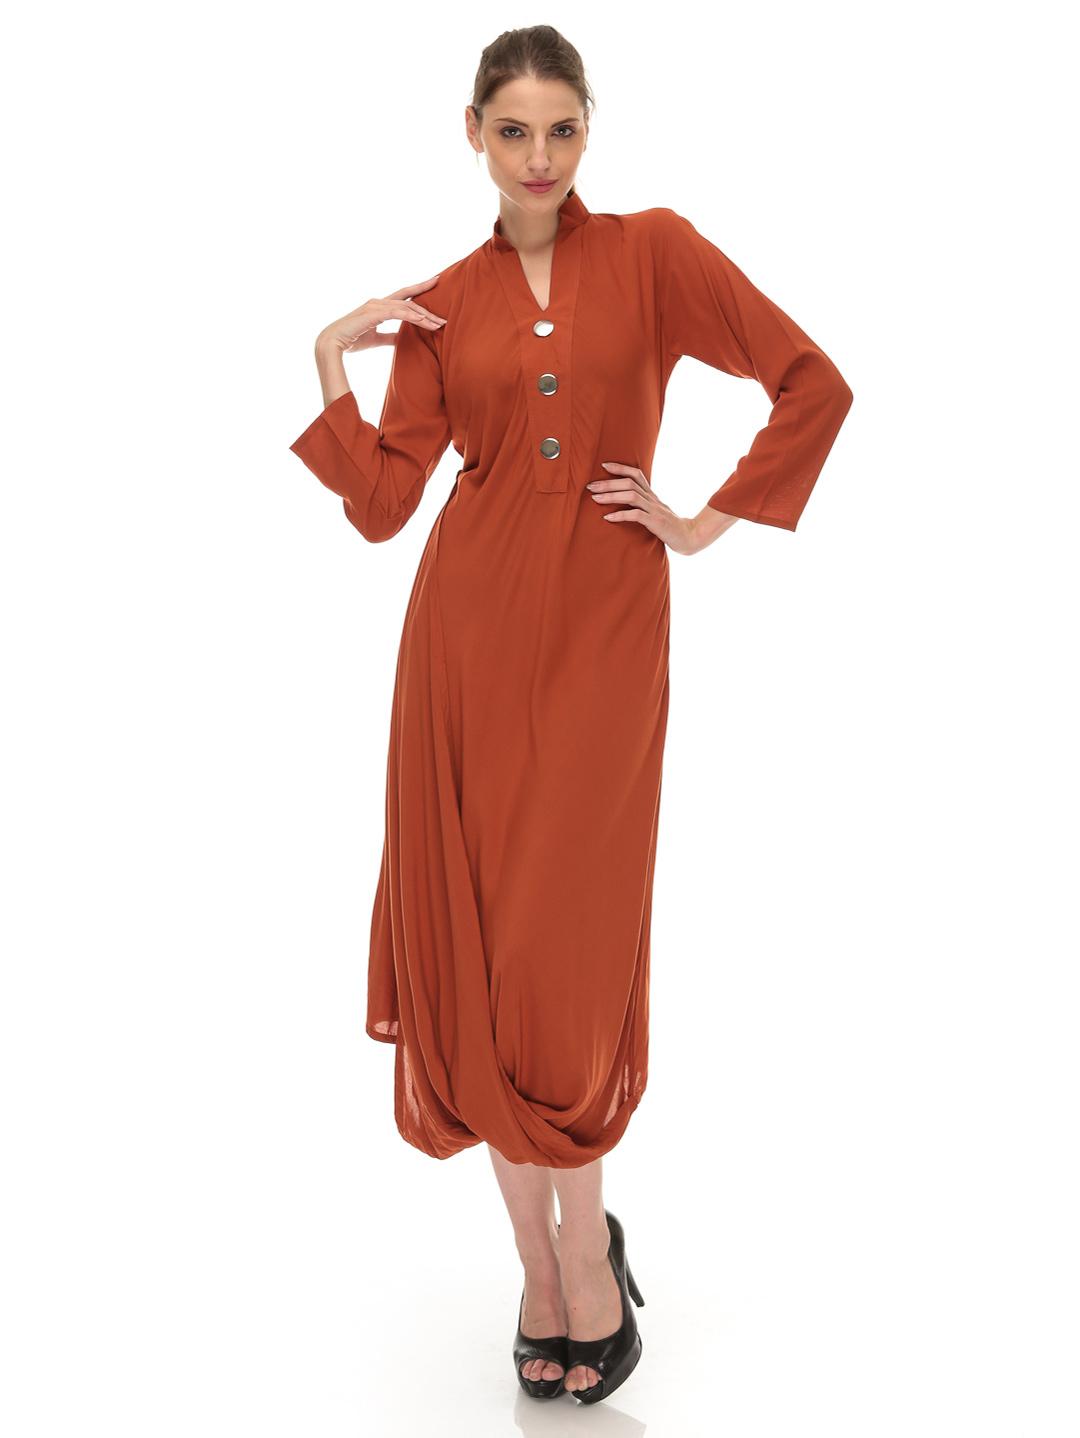 Arzu gul clothing new long tunics shirt fashion 2013 for Is a tunic a dress or a shirt